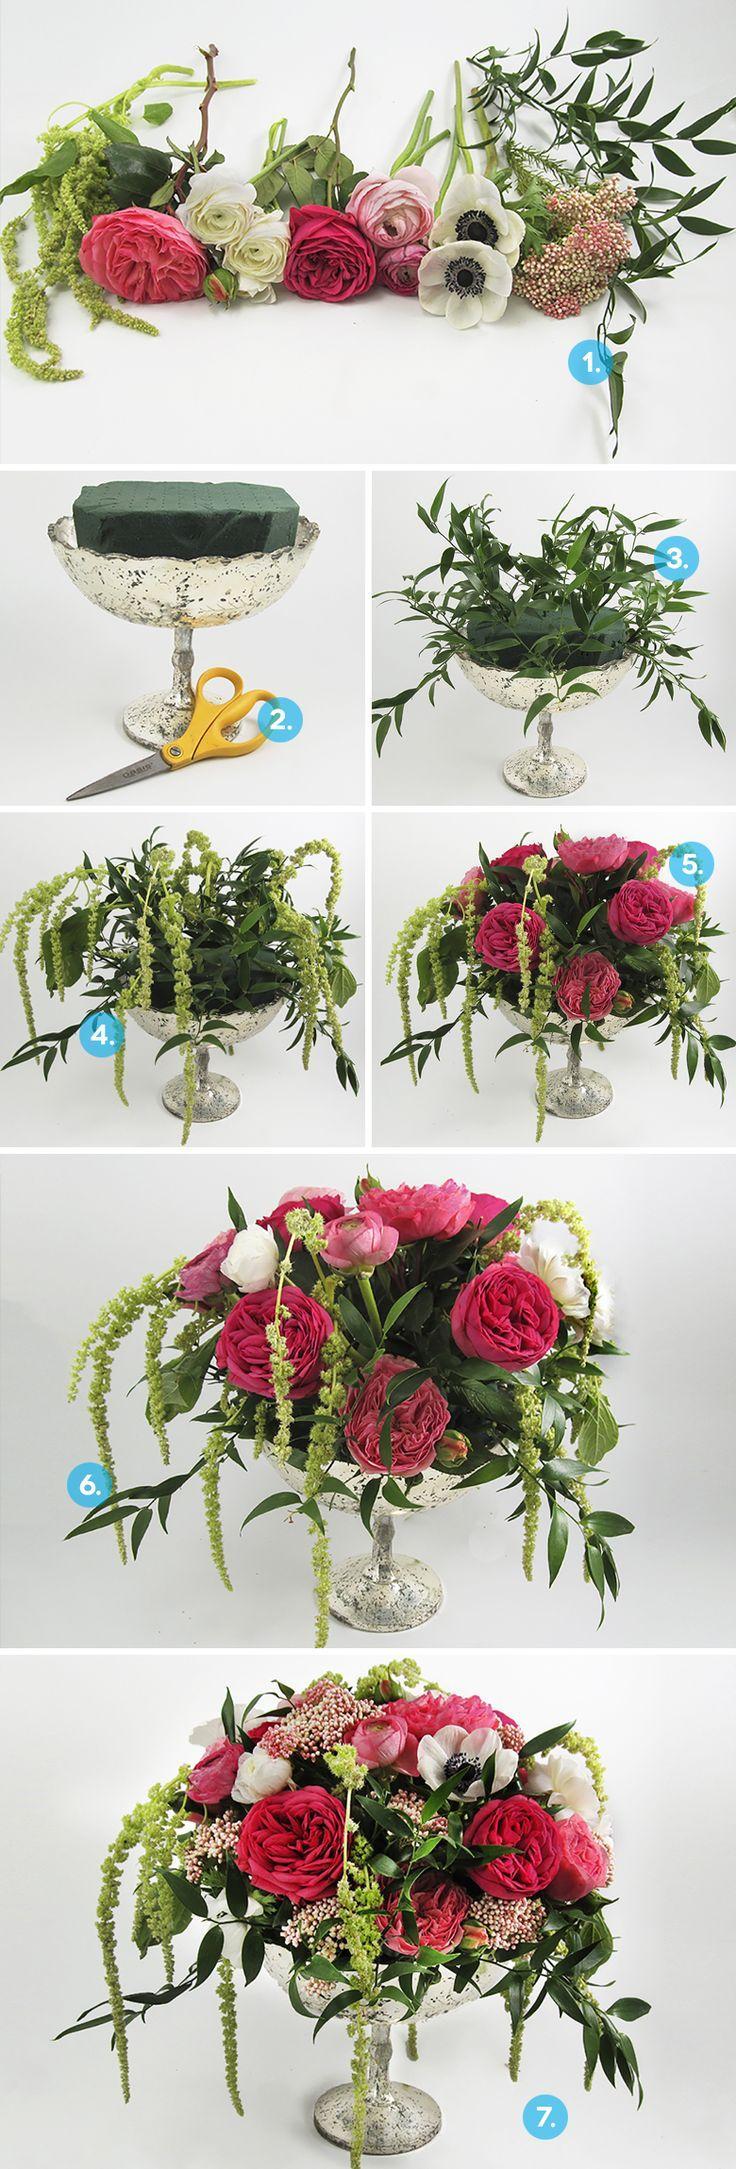 Wedding - How To: Create A DIY Anemone Centerpiece